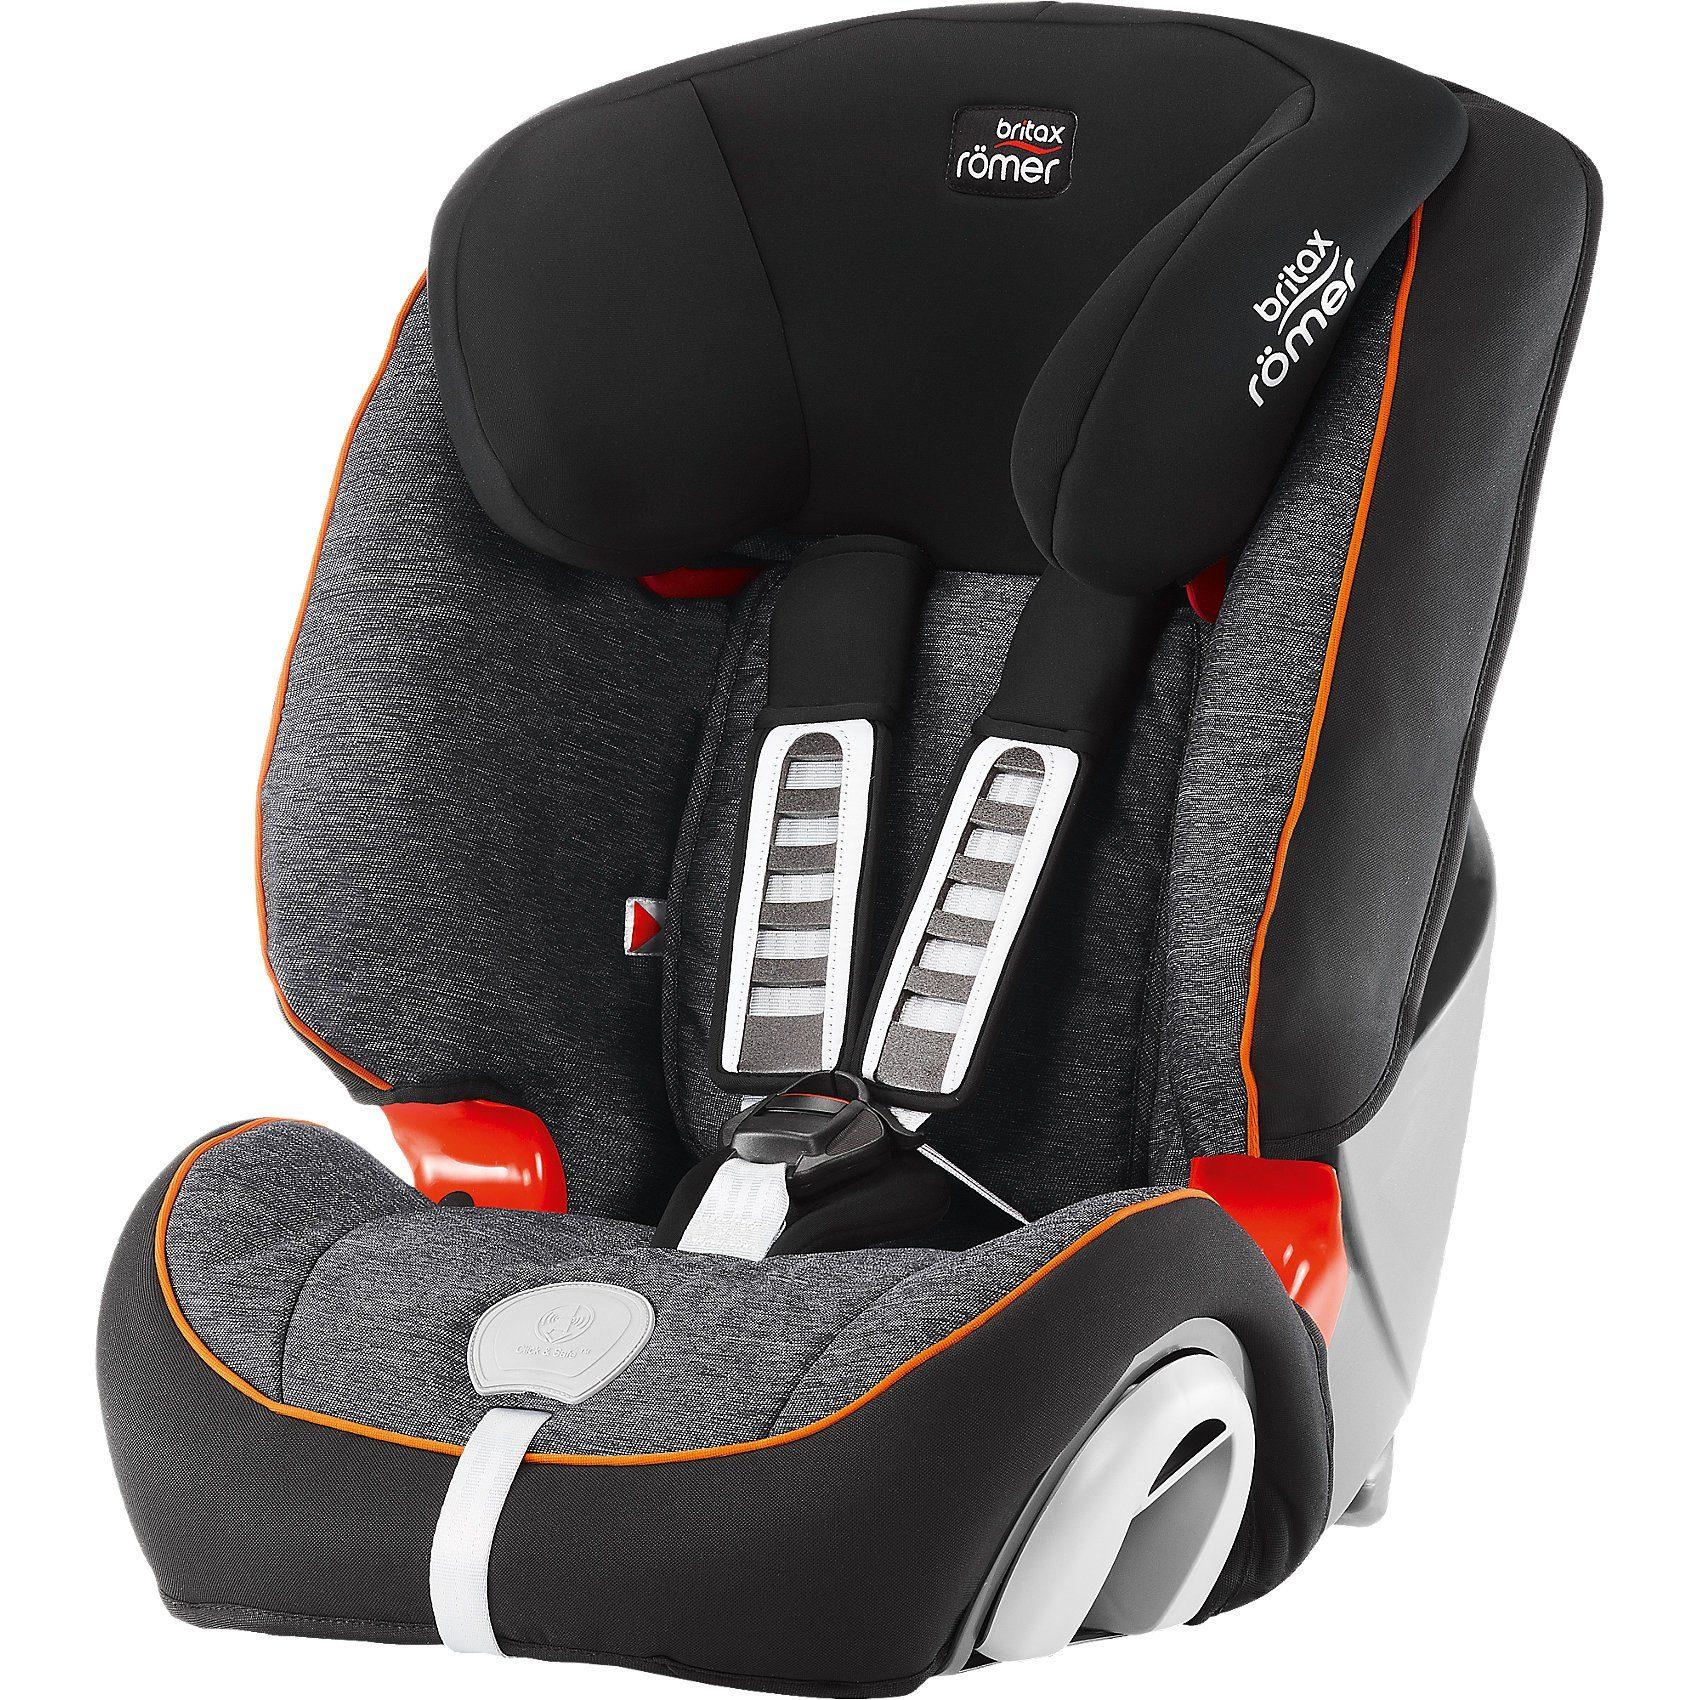 Britax Römer Auto-Kindersitz Evolva 1-2-3 Plus, Black Marble, 2016